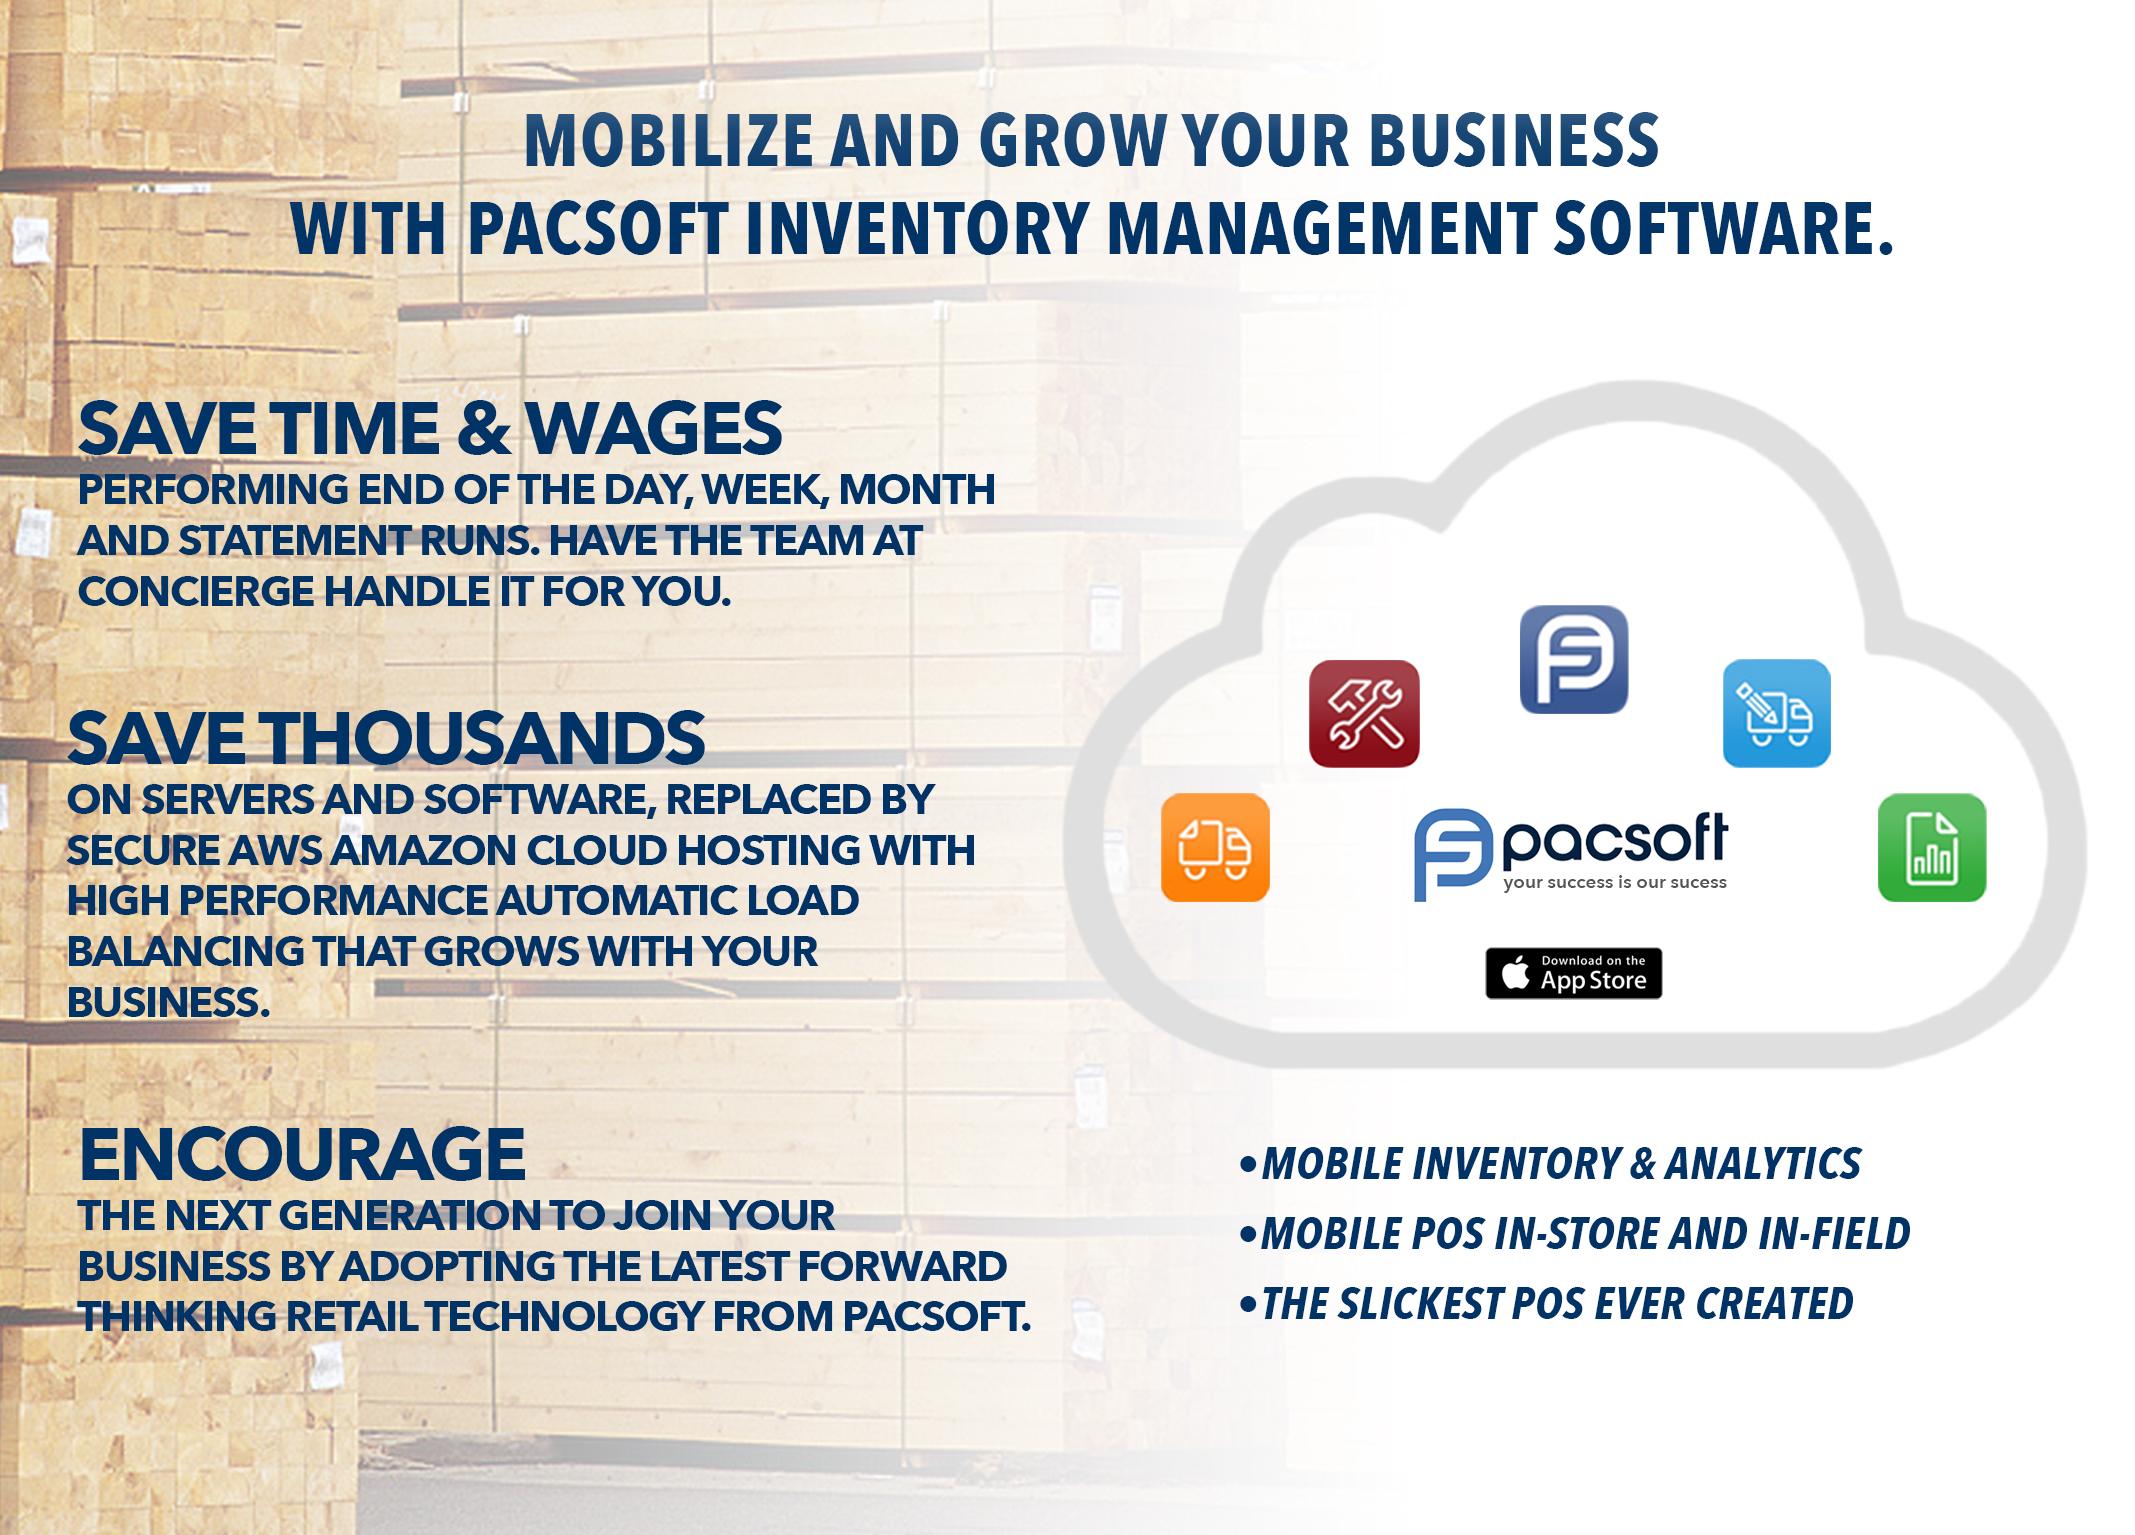 pacsoft 1 back.jpg